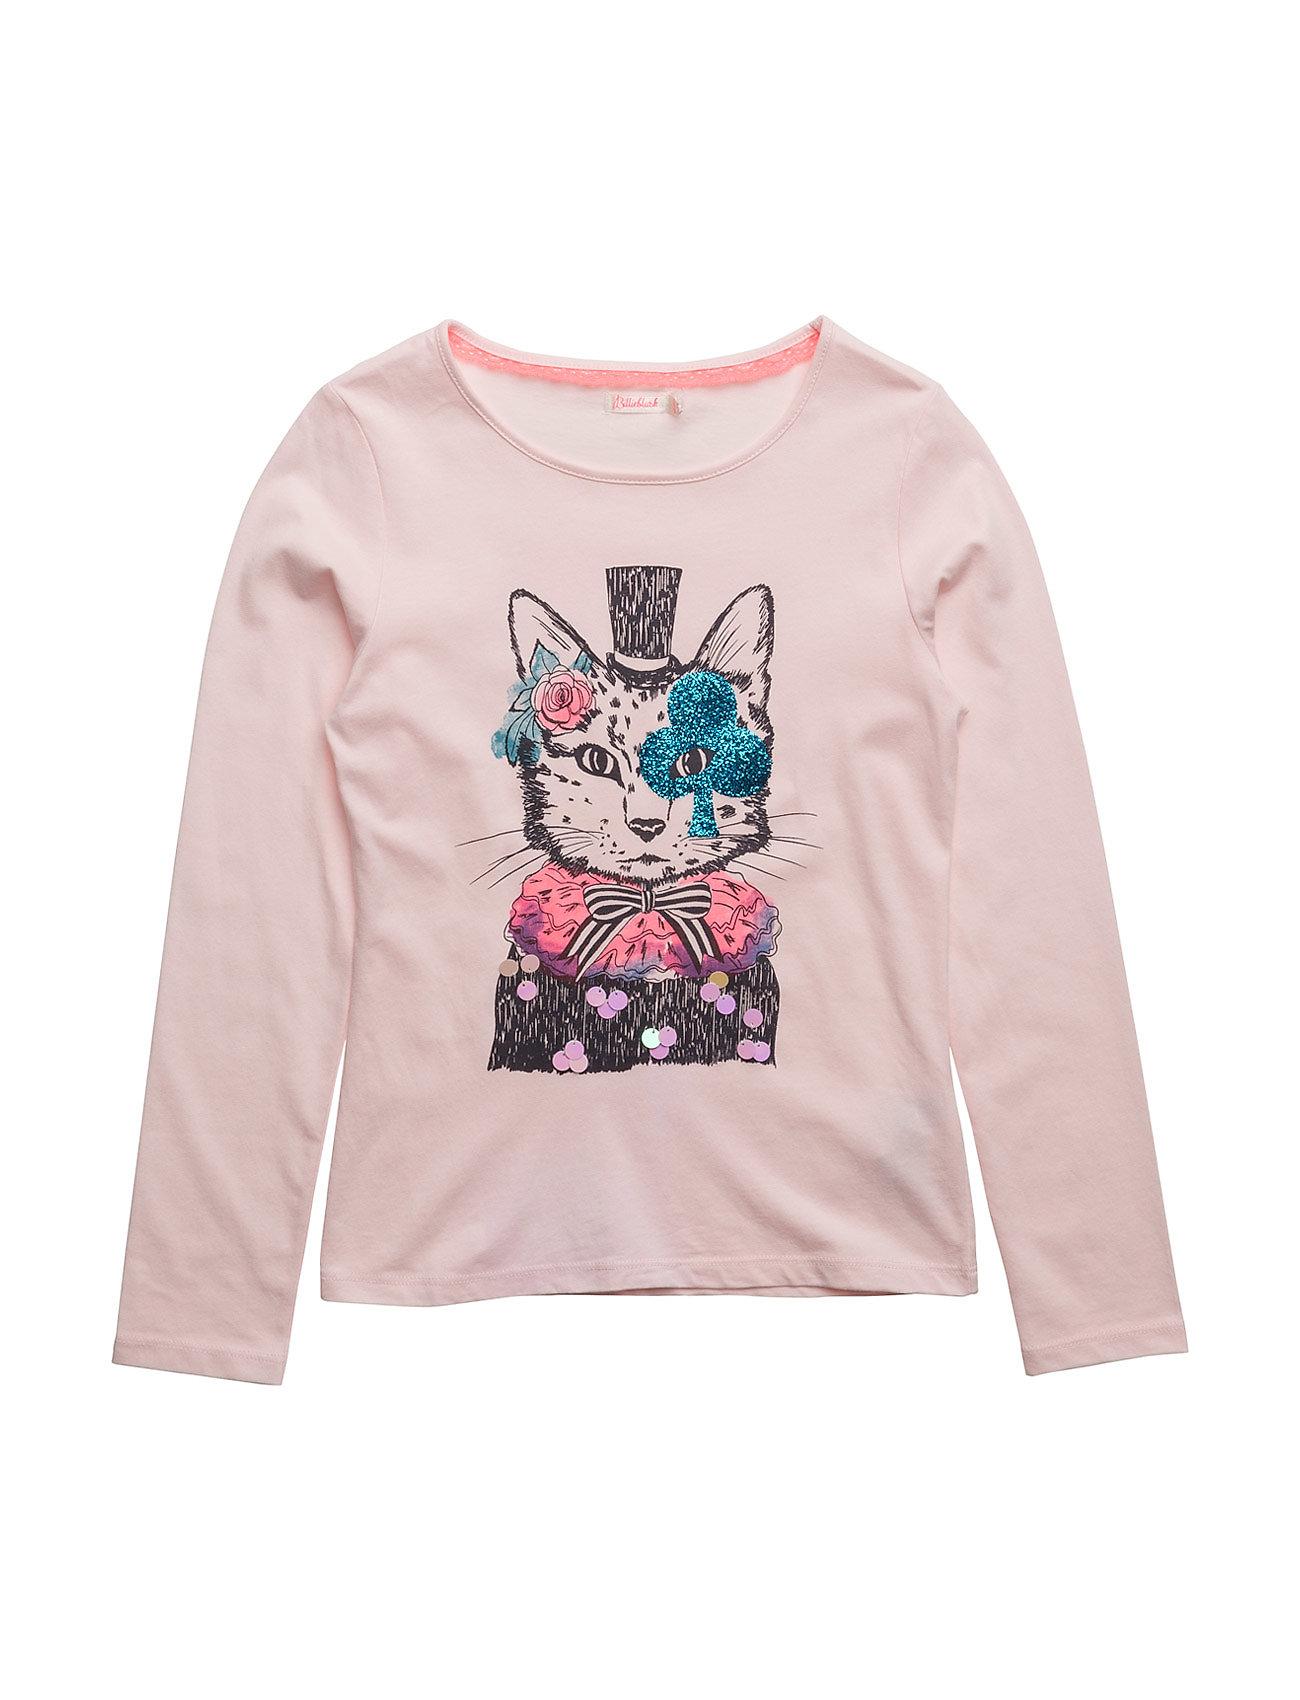 T-Shirt Billieblush Langærmede t-shirts til Børn i Lyserød